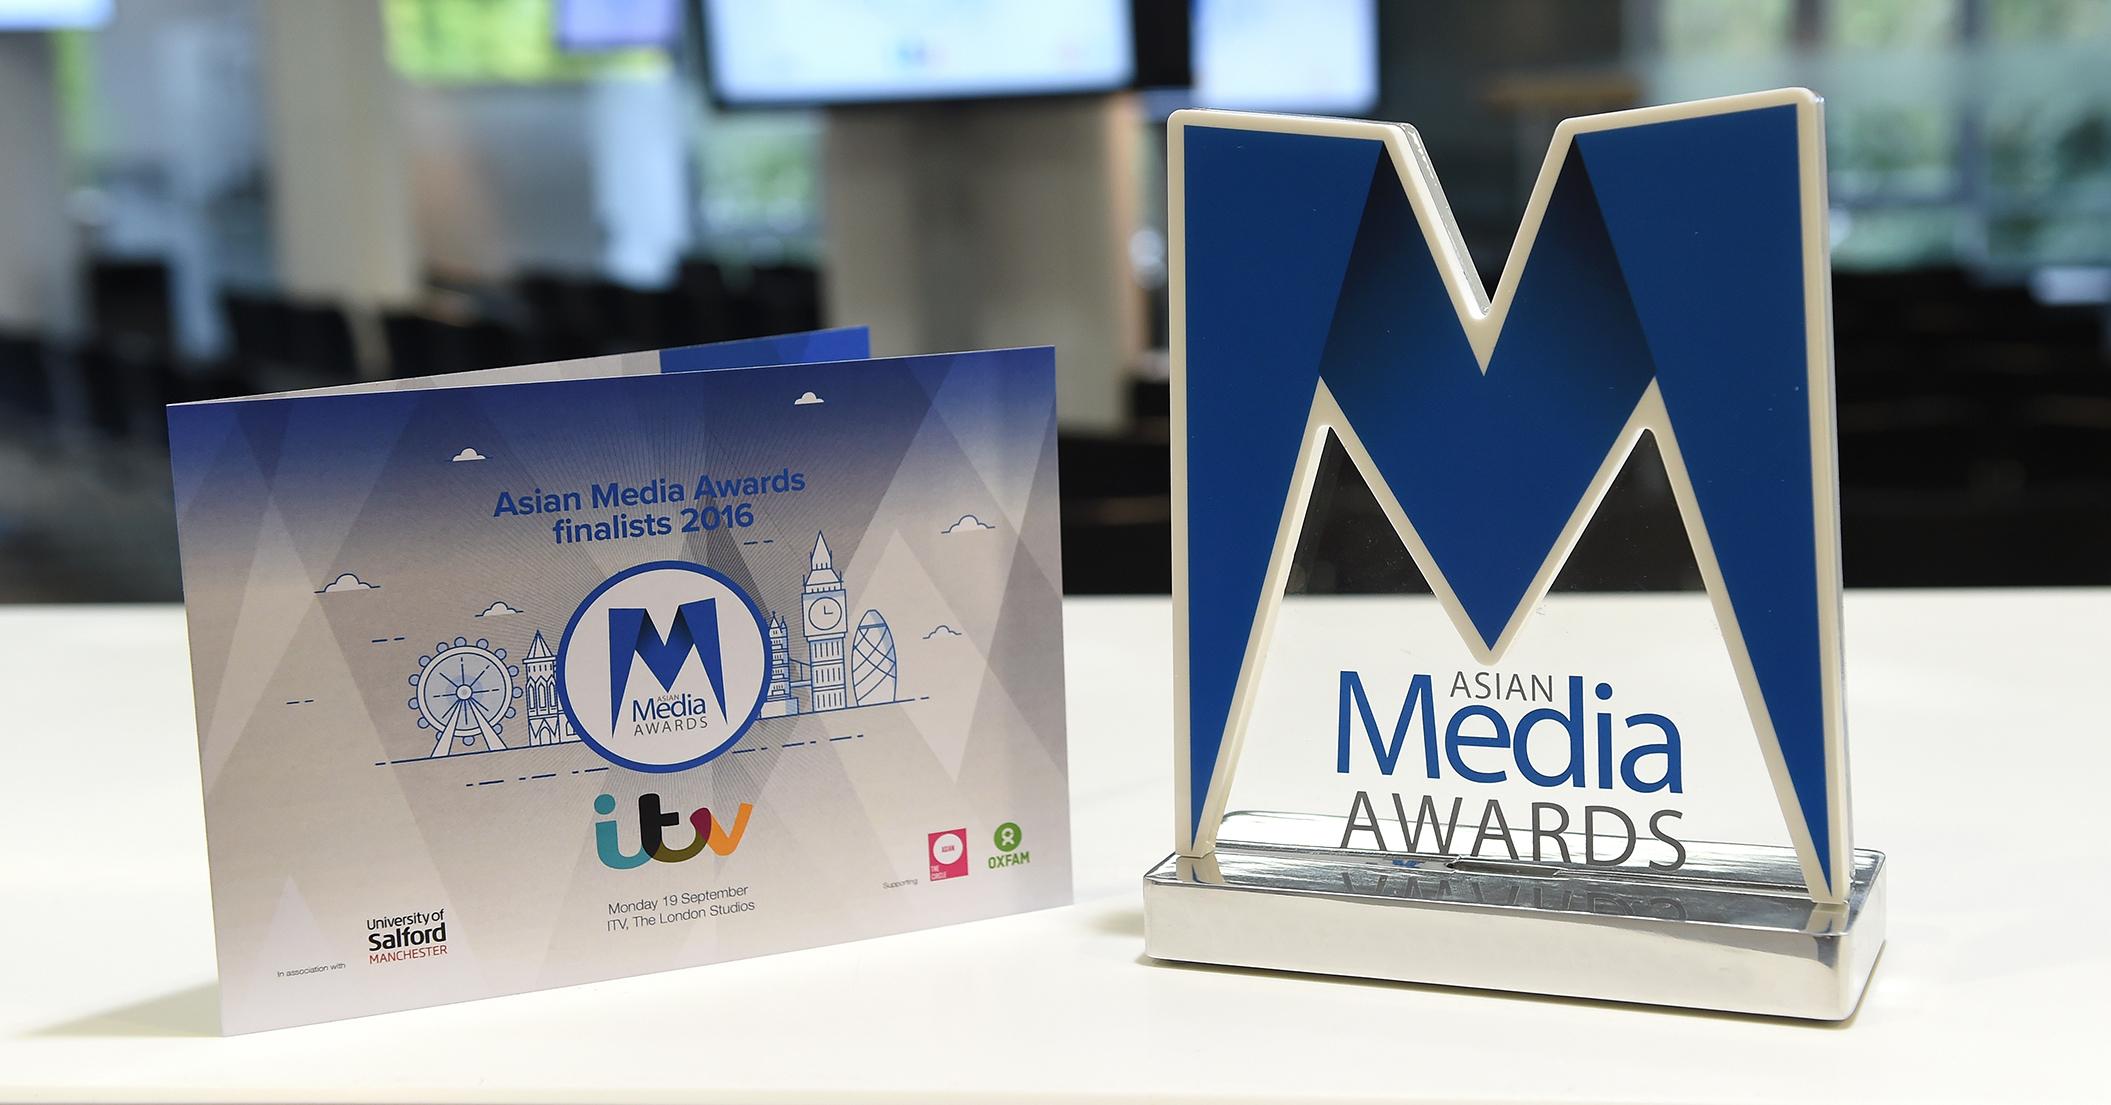 Asian Media Awards 2016 Finalists